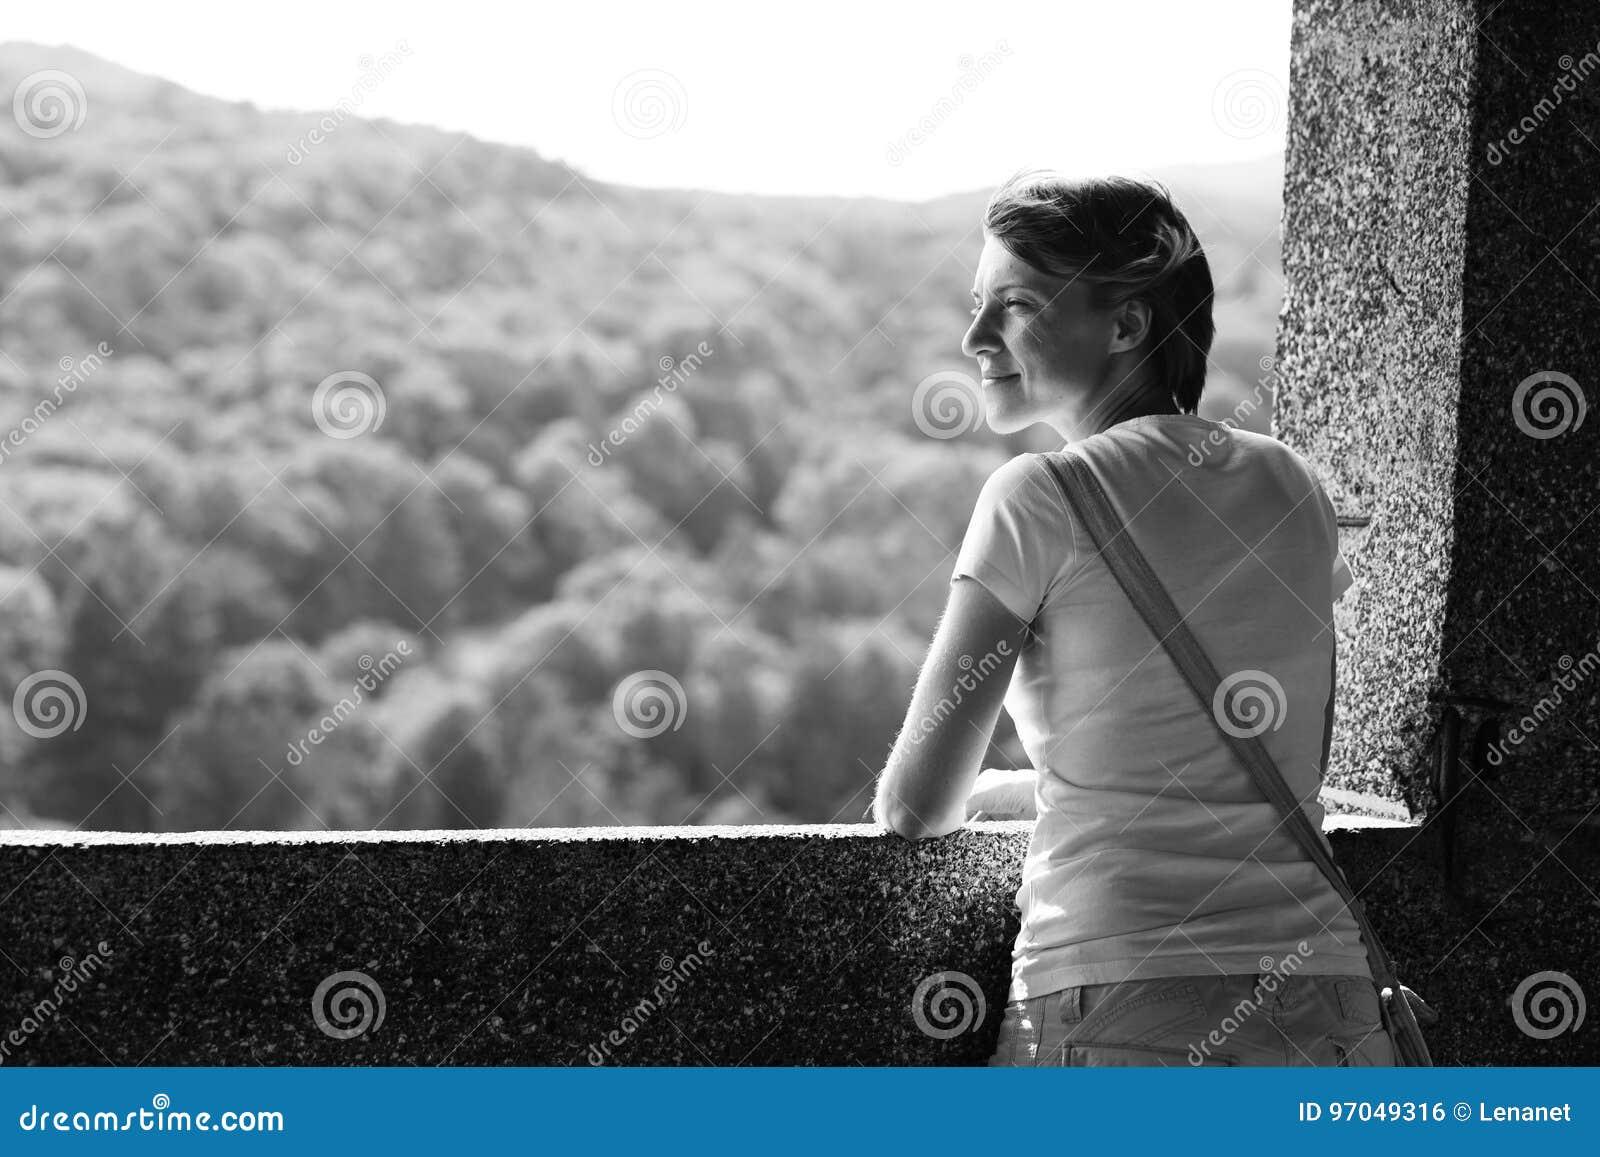 Through the castle window